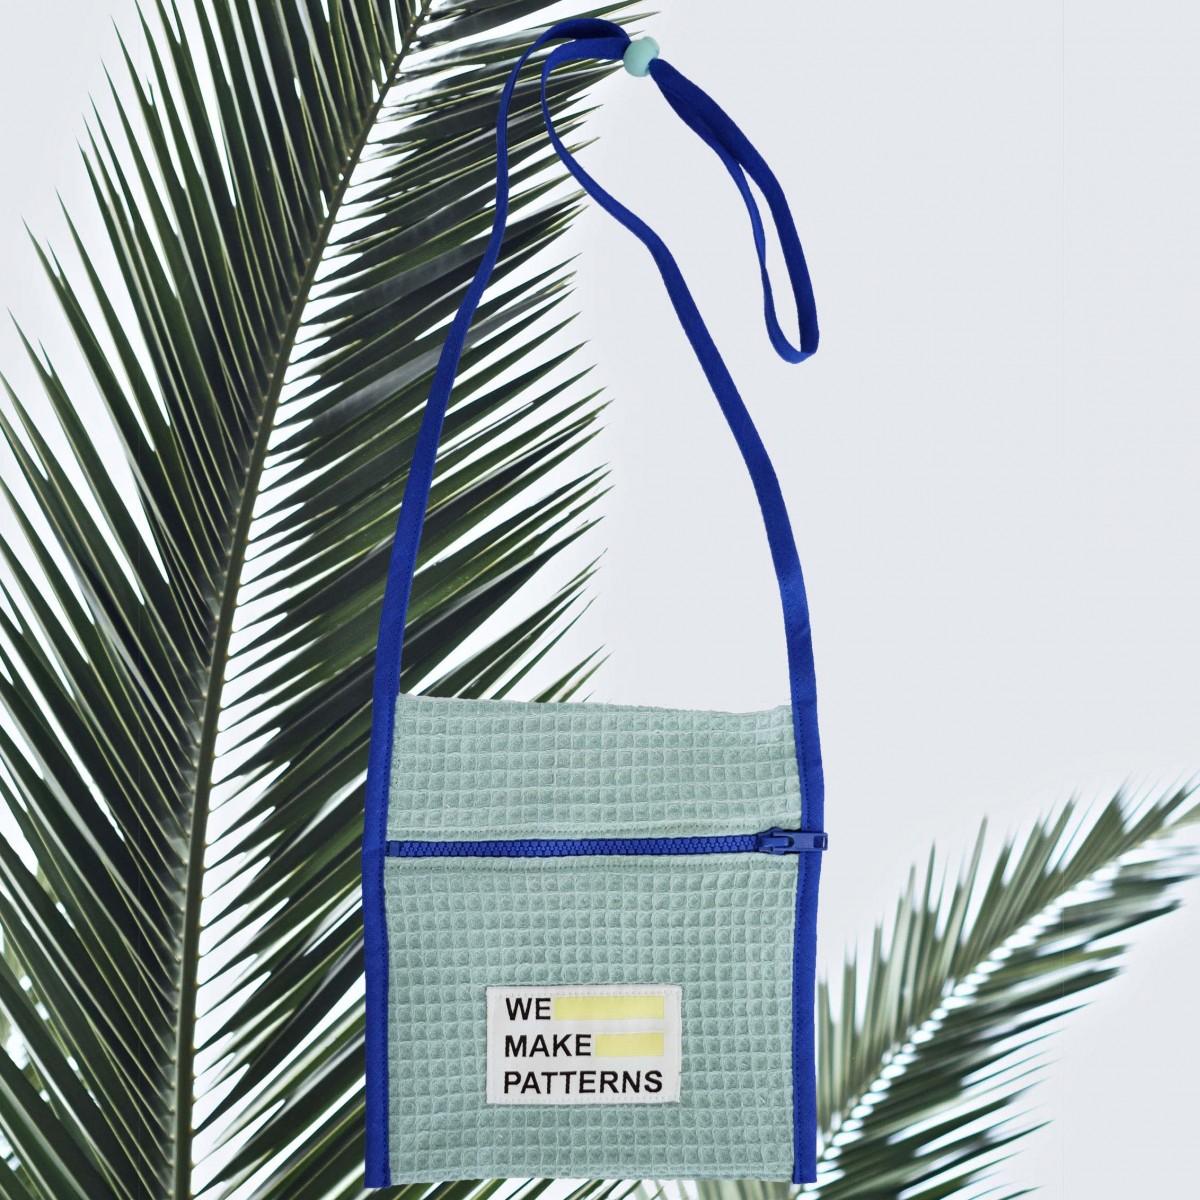 We Make Patterns - Traveller's Purse Mint